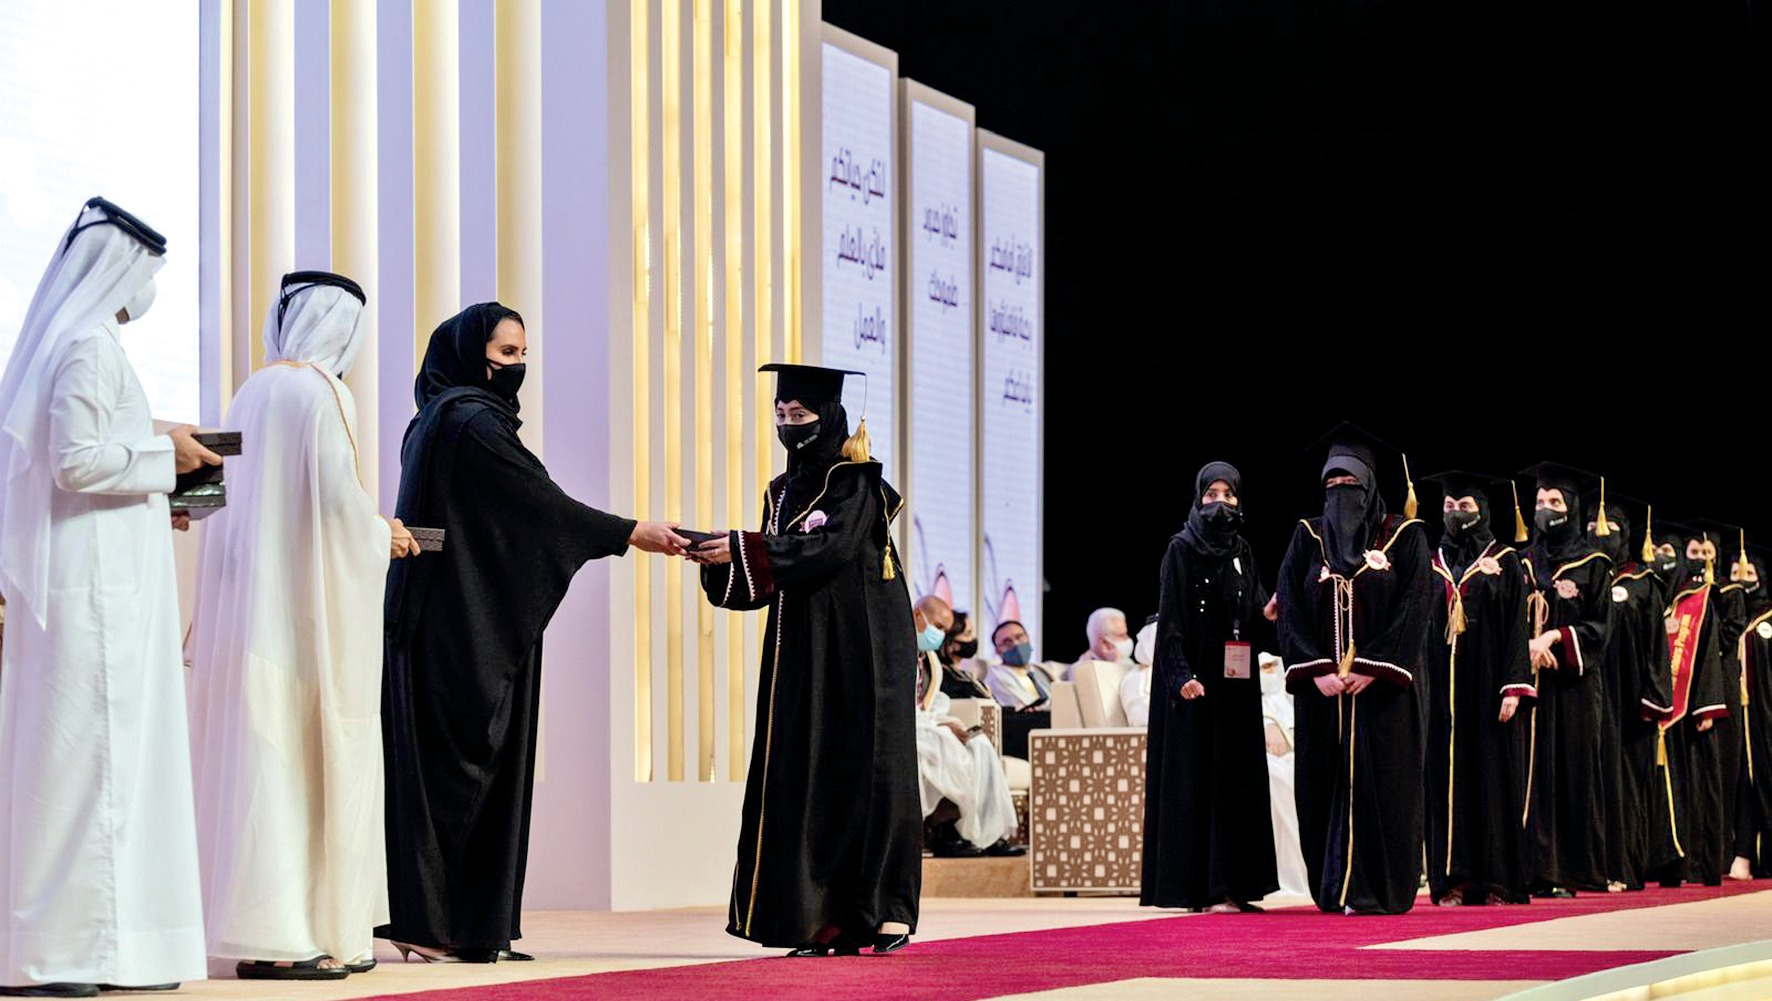 Sheikha Jawaher Honours Outstanding QU's Female Graduates